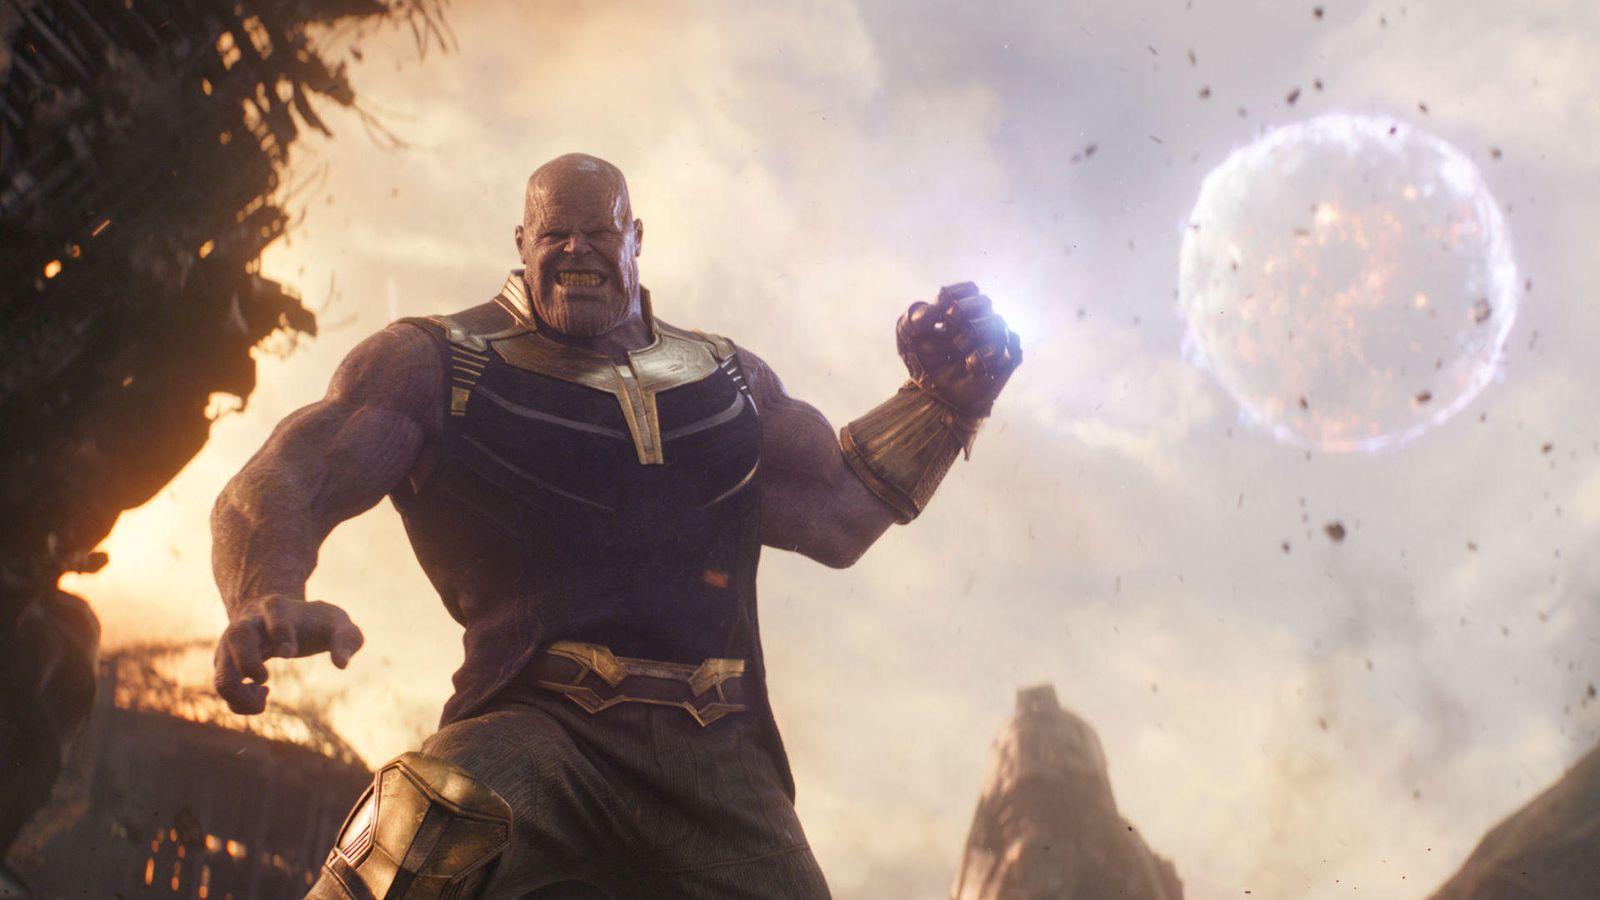 4.) Josh Brolin, Avengers: Infinity War